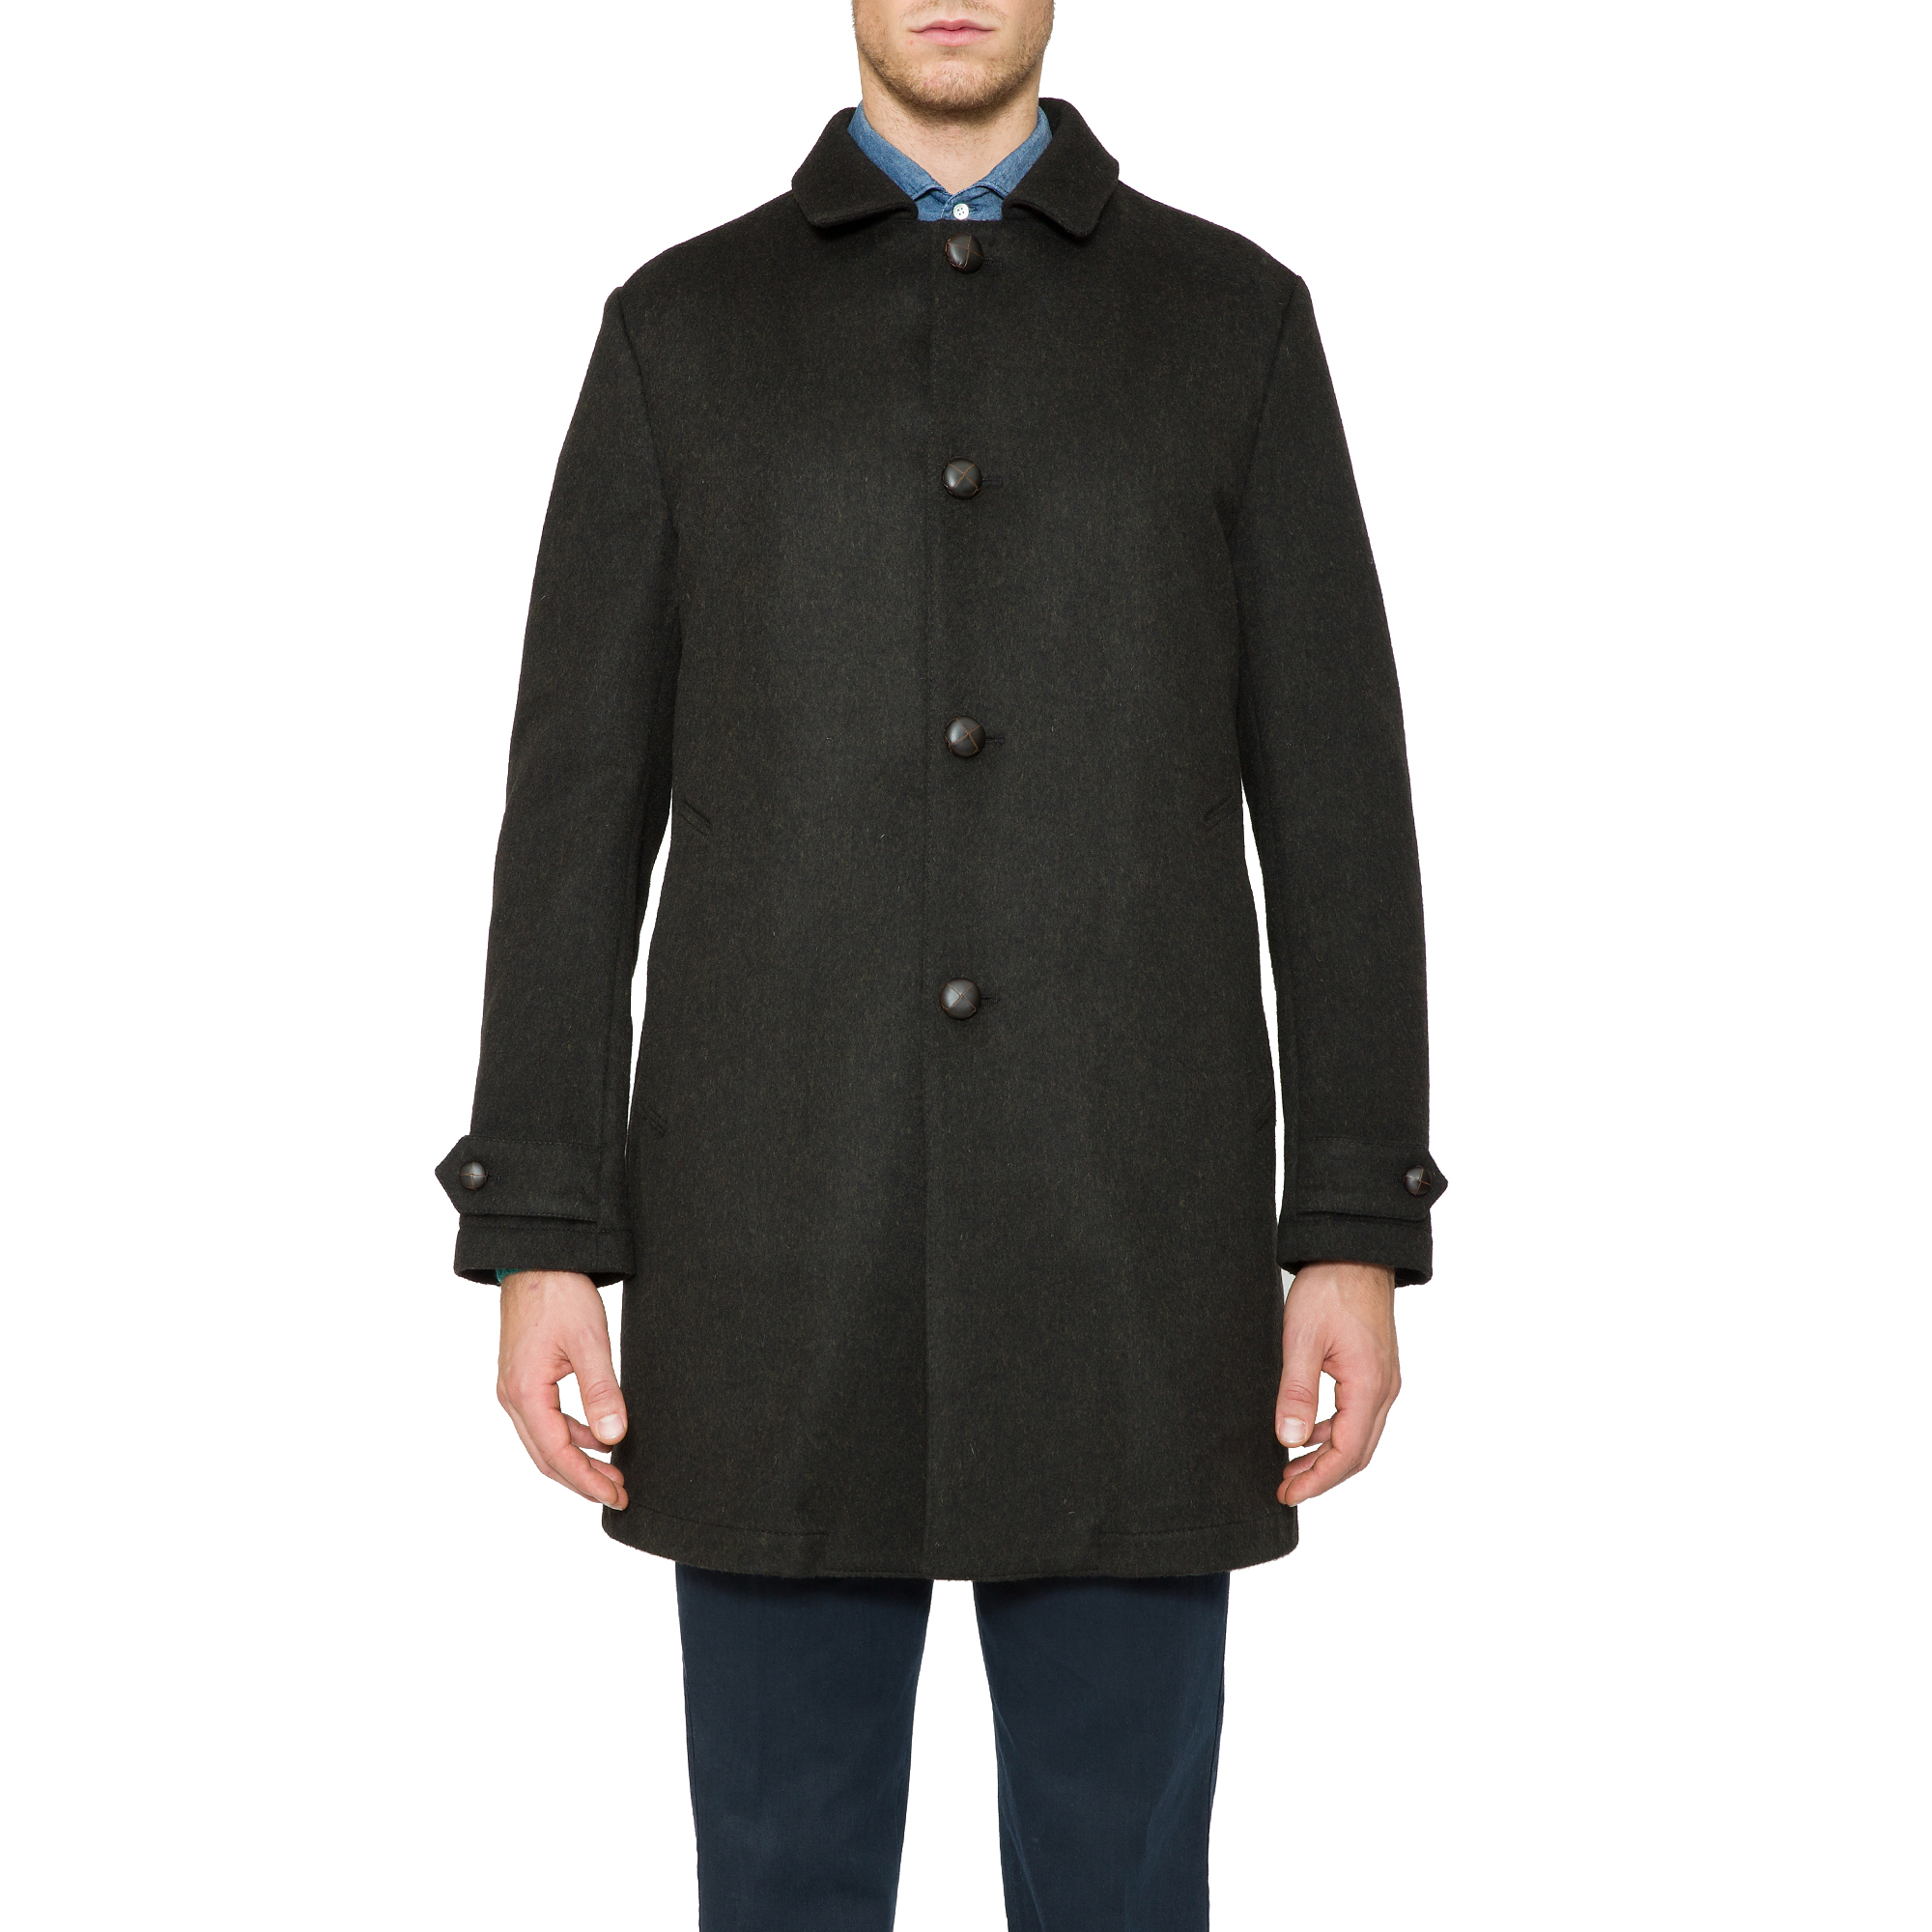 Aspesi Loden Wool Perfetto Coat In Green For Men Lyst